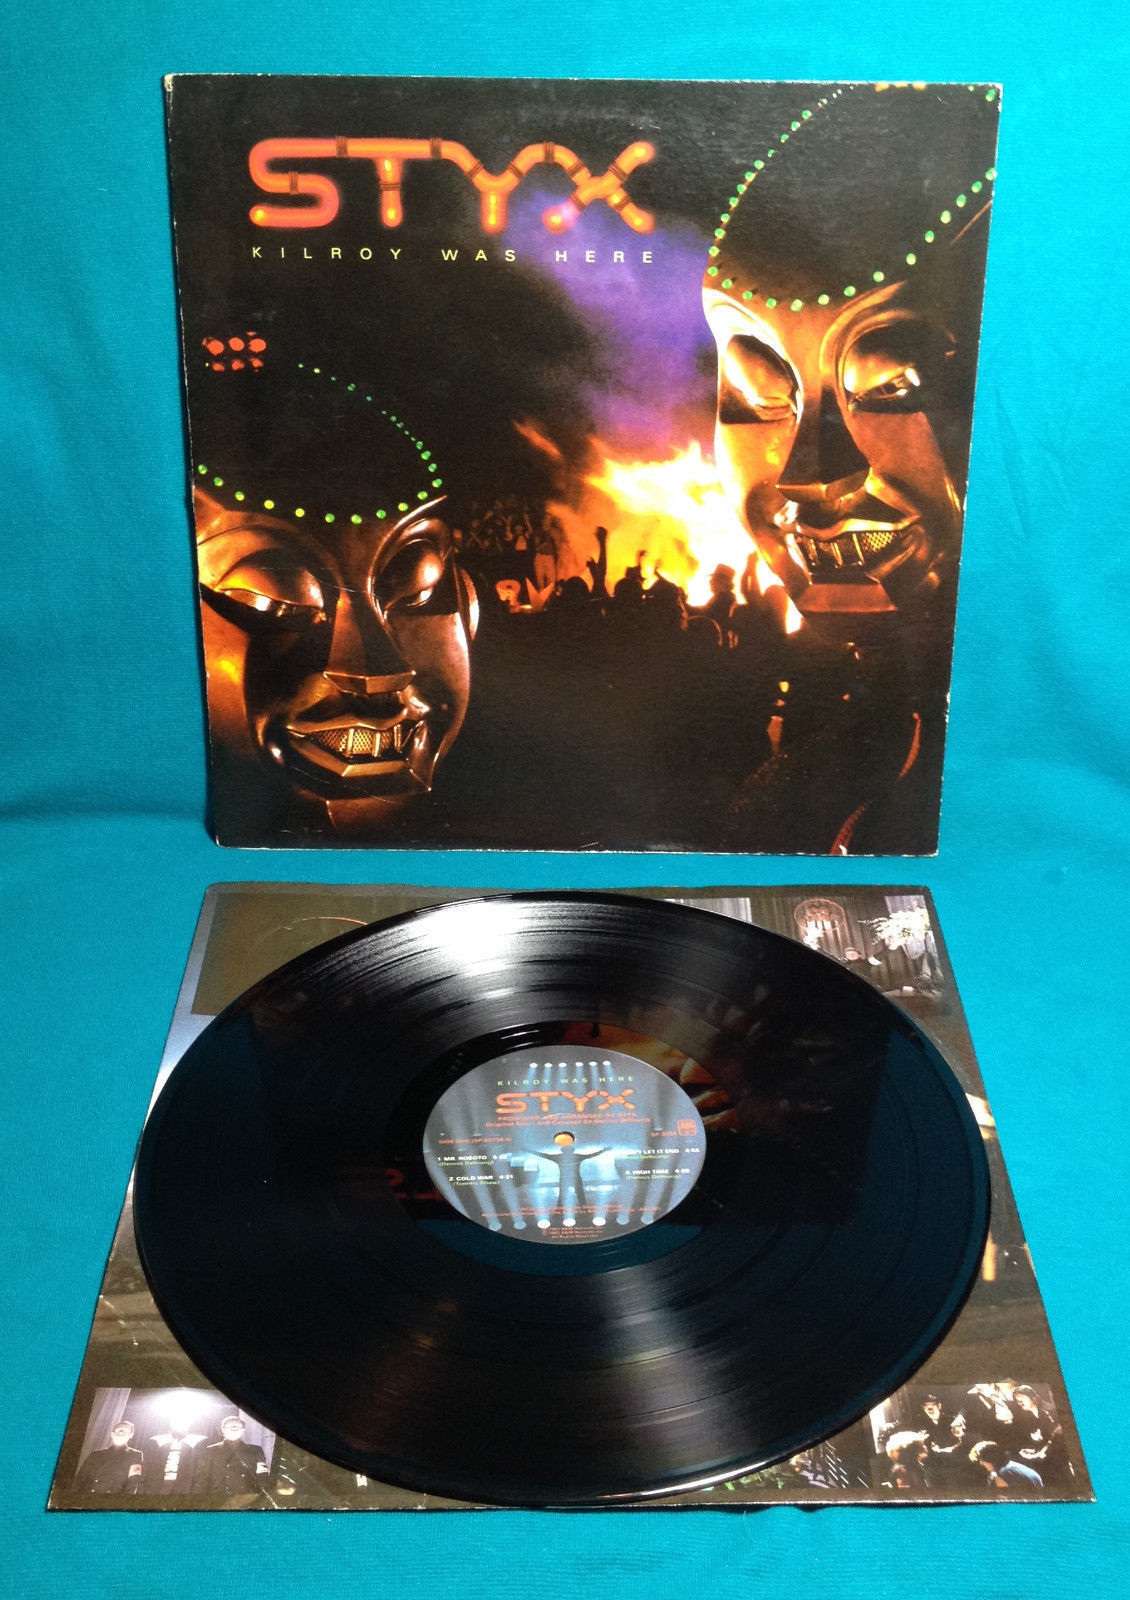 Styx Kilroy Was Here LP Vinyl Record 1983 A&M Gatefold Music Album VERY GOOD